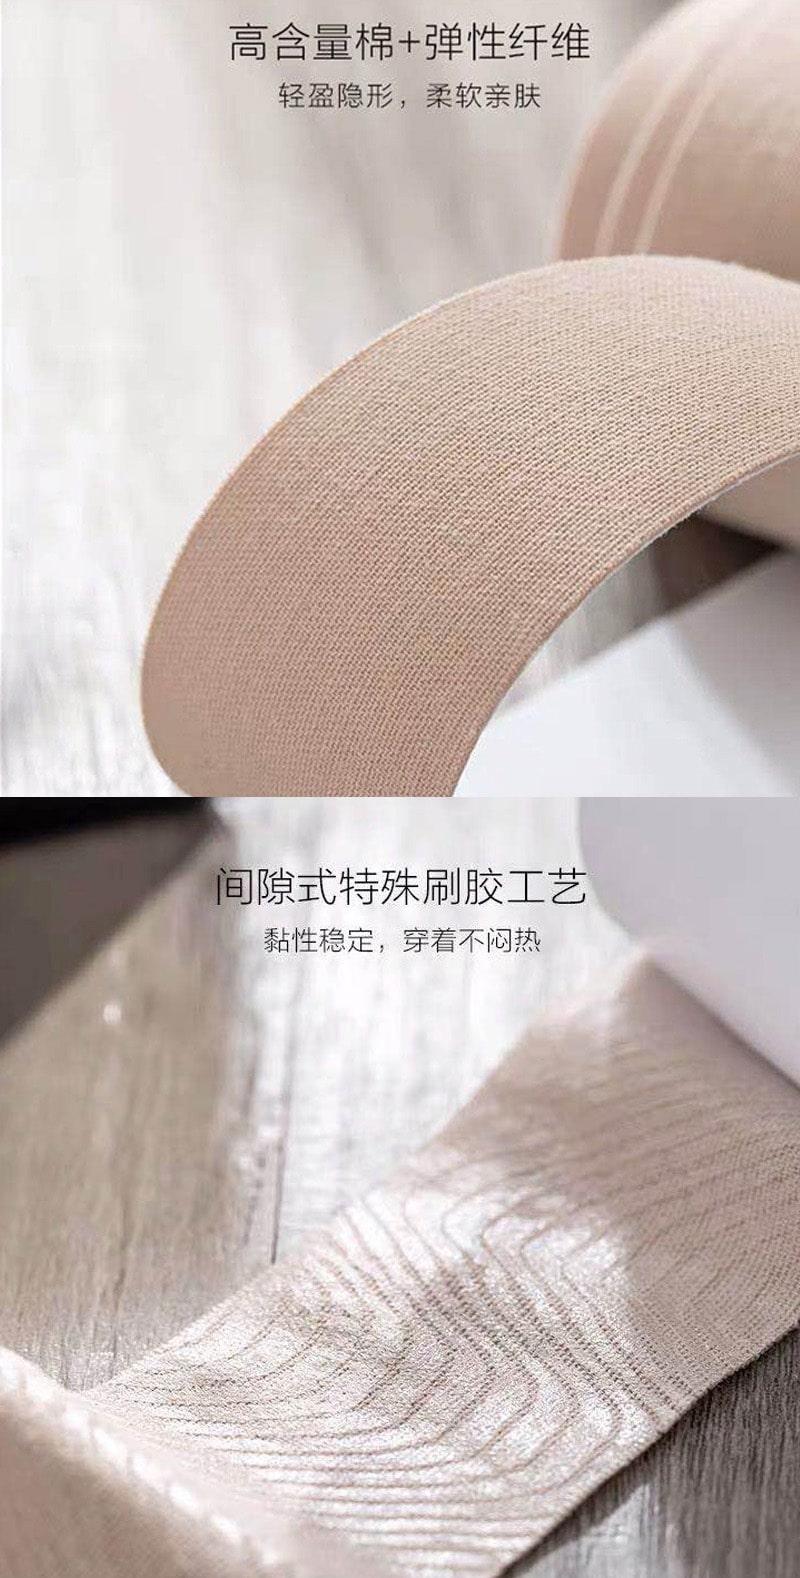 Beauty Enhancer Boob Tape - Material